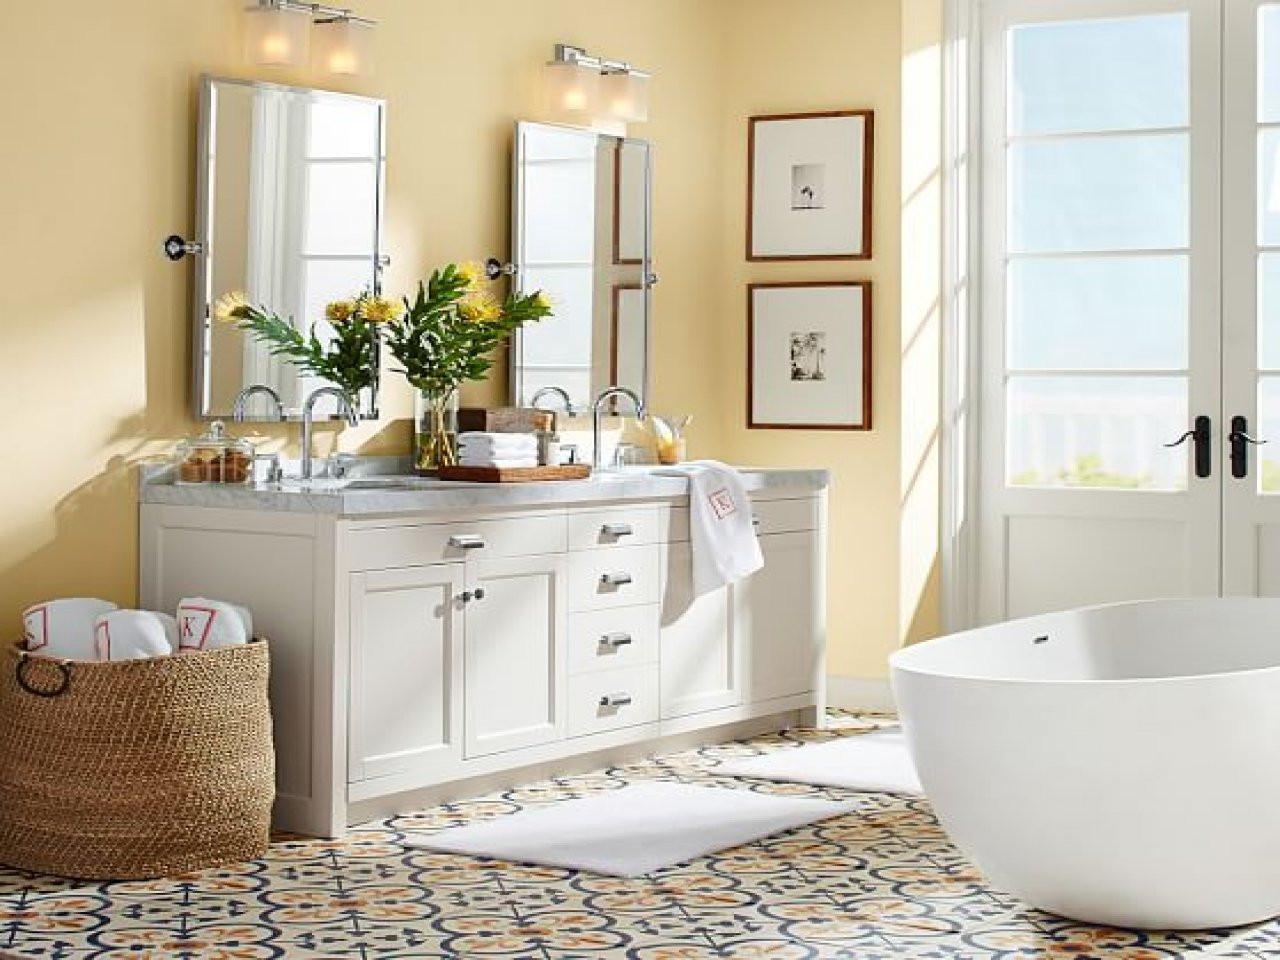 Pivoting Mirror Bathroom  Pivot Mirror Bathroom The Kienandsweet Furnitures